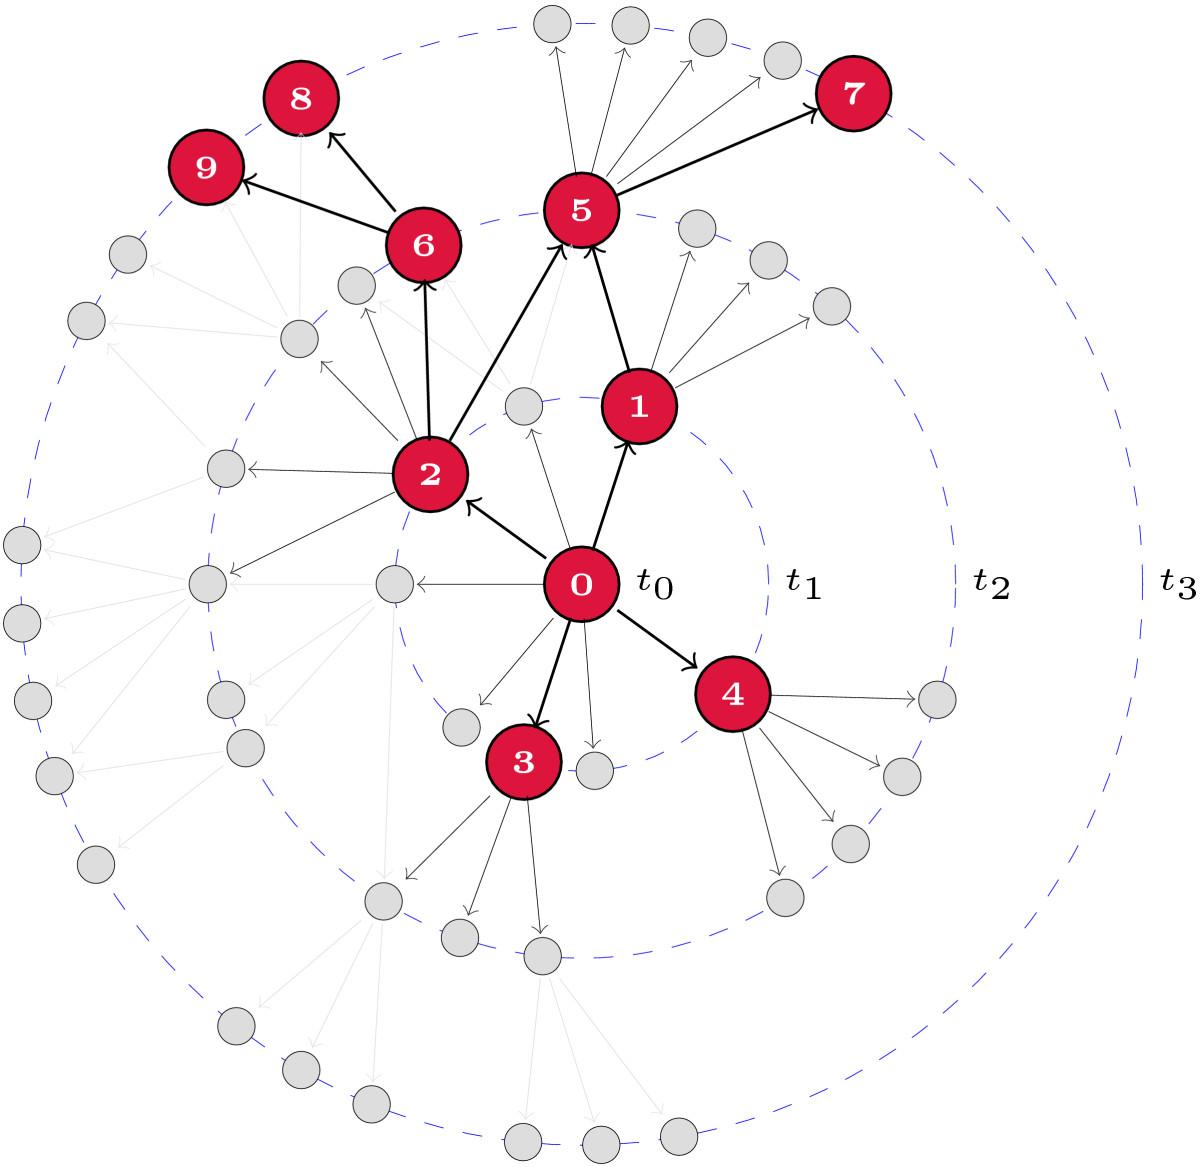 https://static-content.springer.com/image/art%3A10.1140%2Fepjds18/MediaObjects/13688_2013_Article_18_Fig1_HTML.jpg